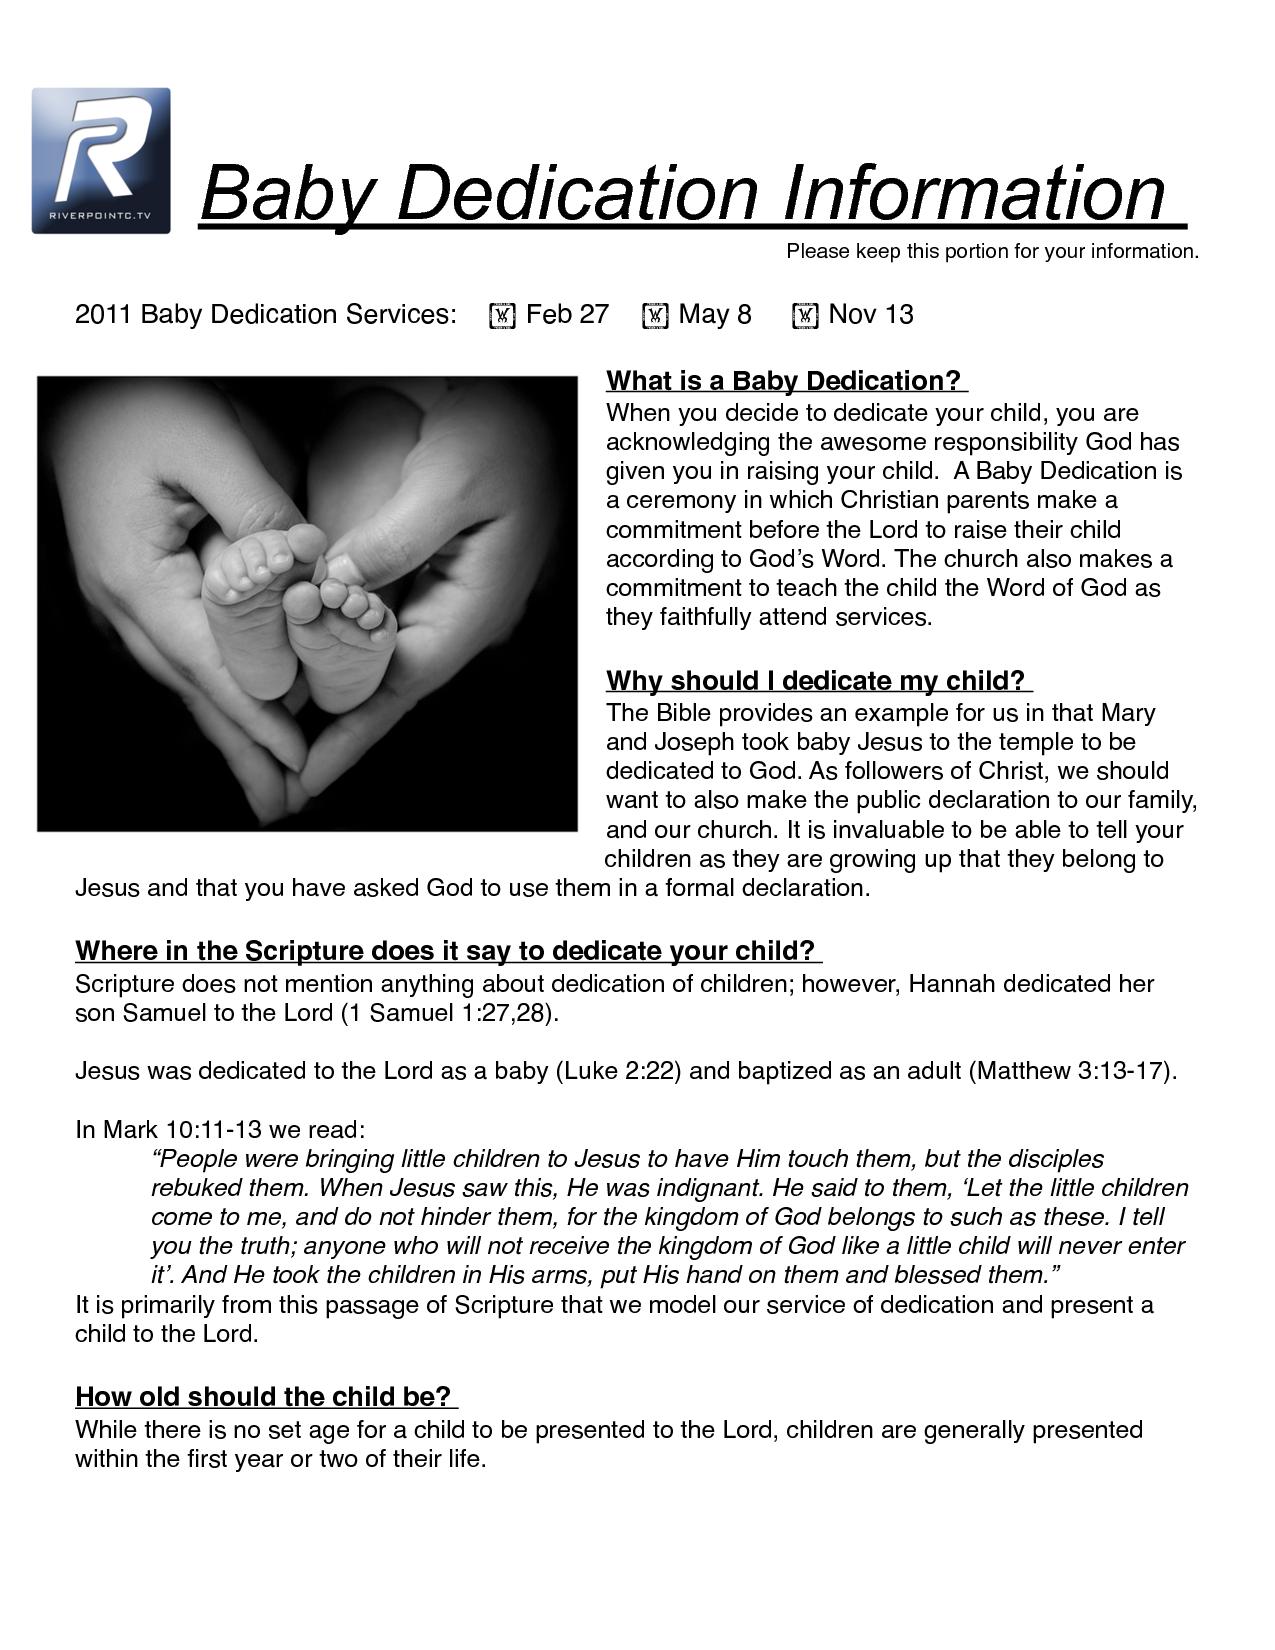 Baby dedication ceremony examples baby dedication certificates baby dedication ceremony examples baby dedication certificates yadclub Image collections